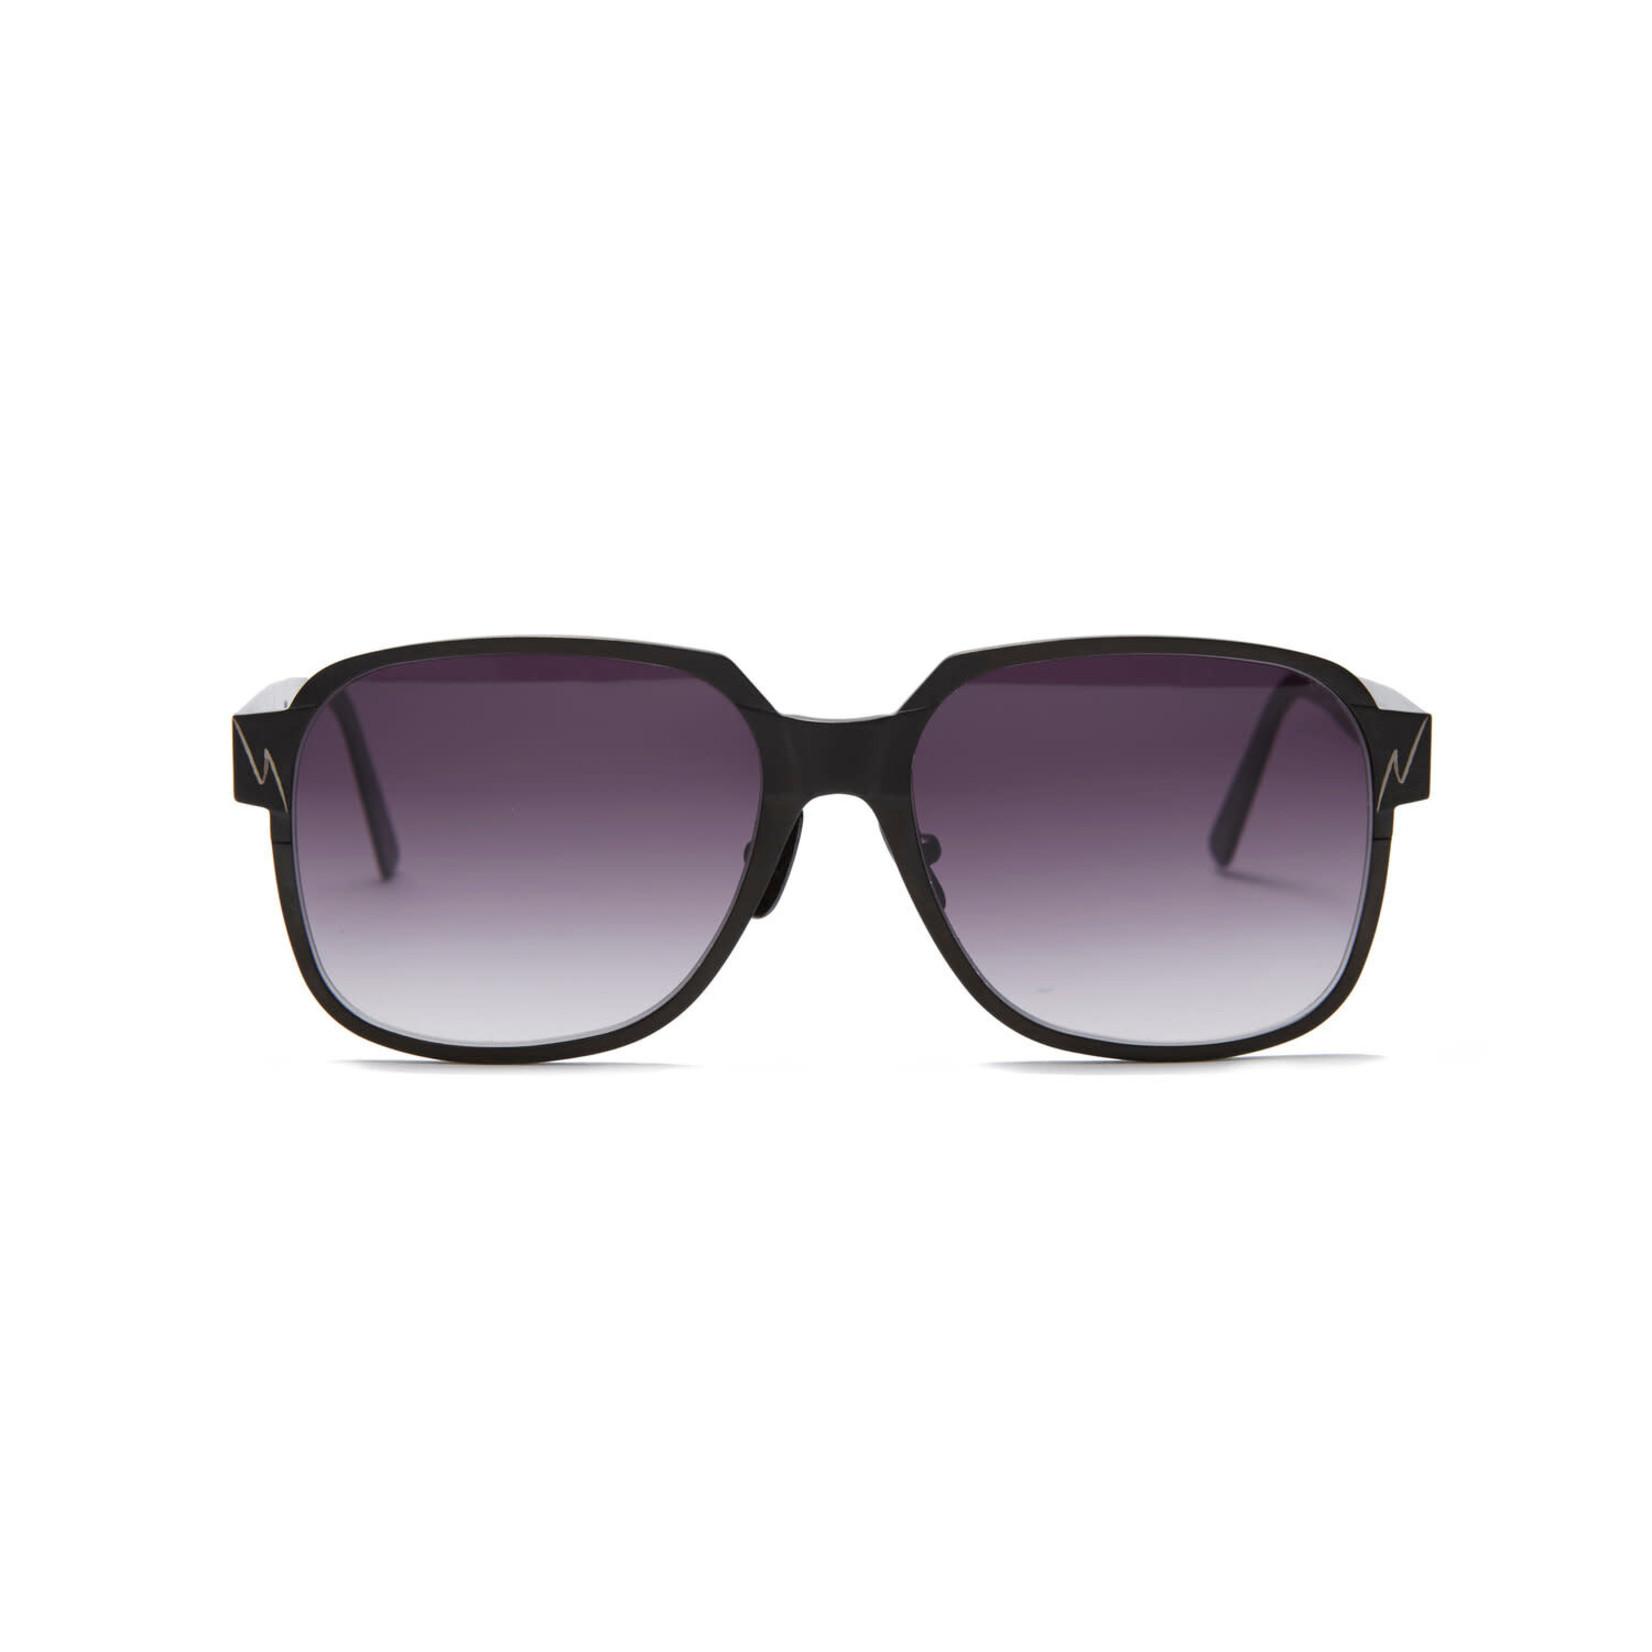 Nessy Khem Dennis Sunglasses